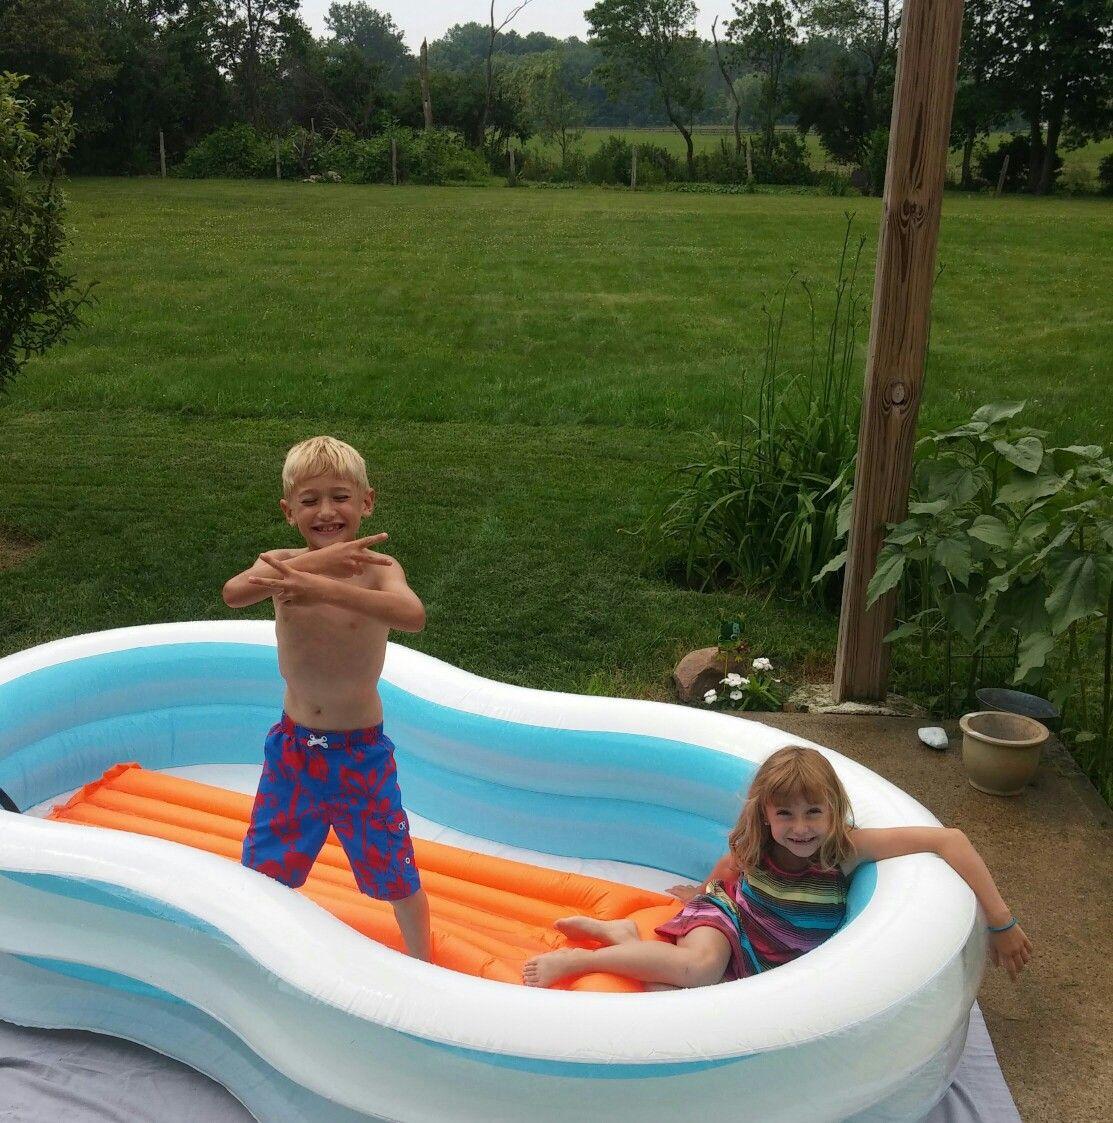 Pin by deanna puskas on sun fun pool float hot tub pool